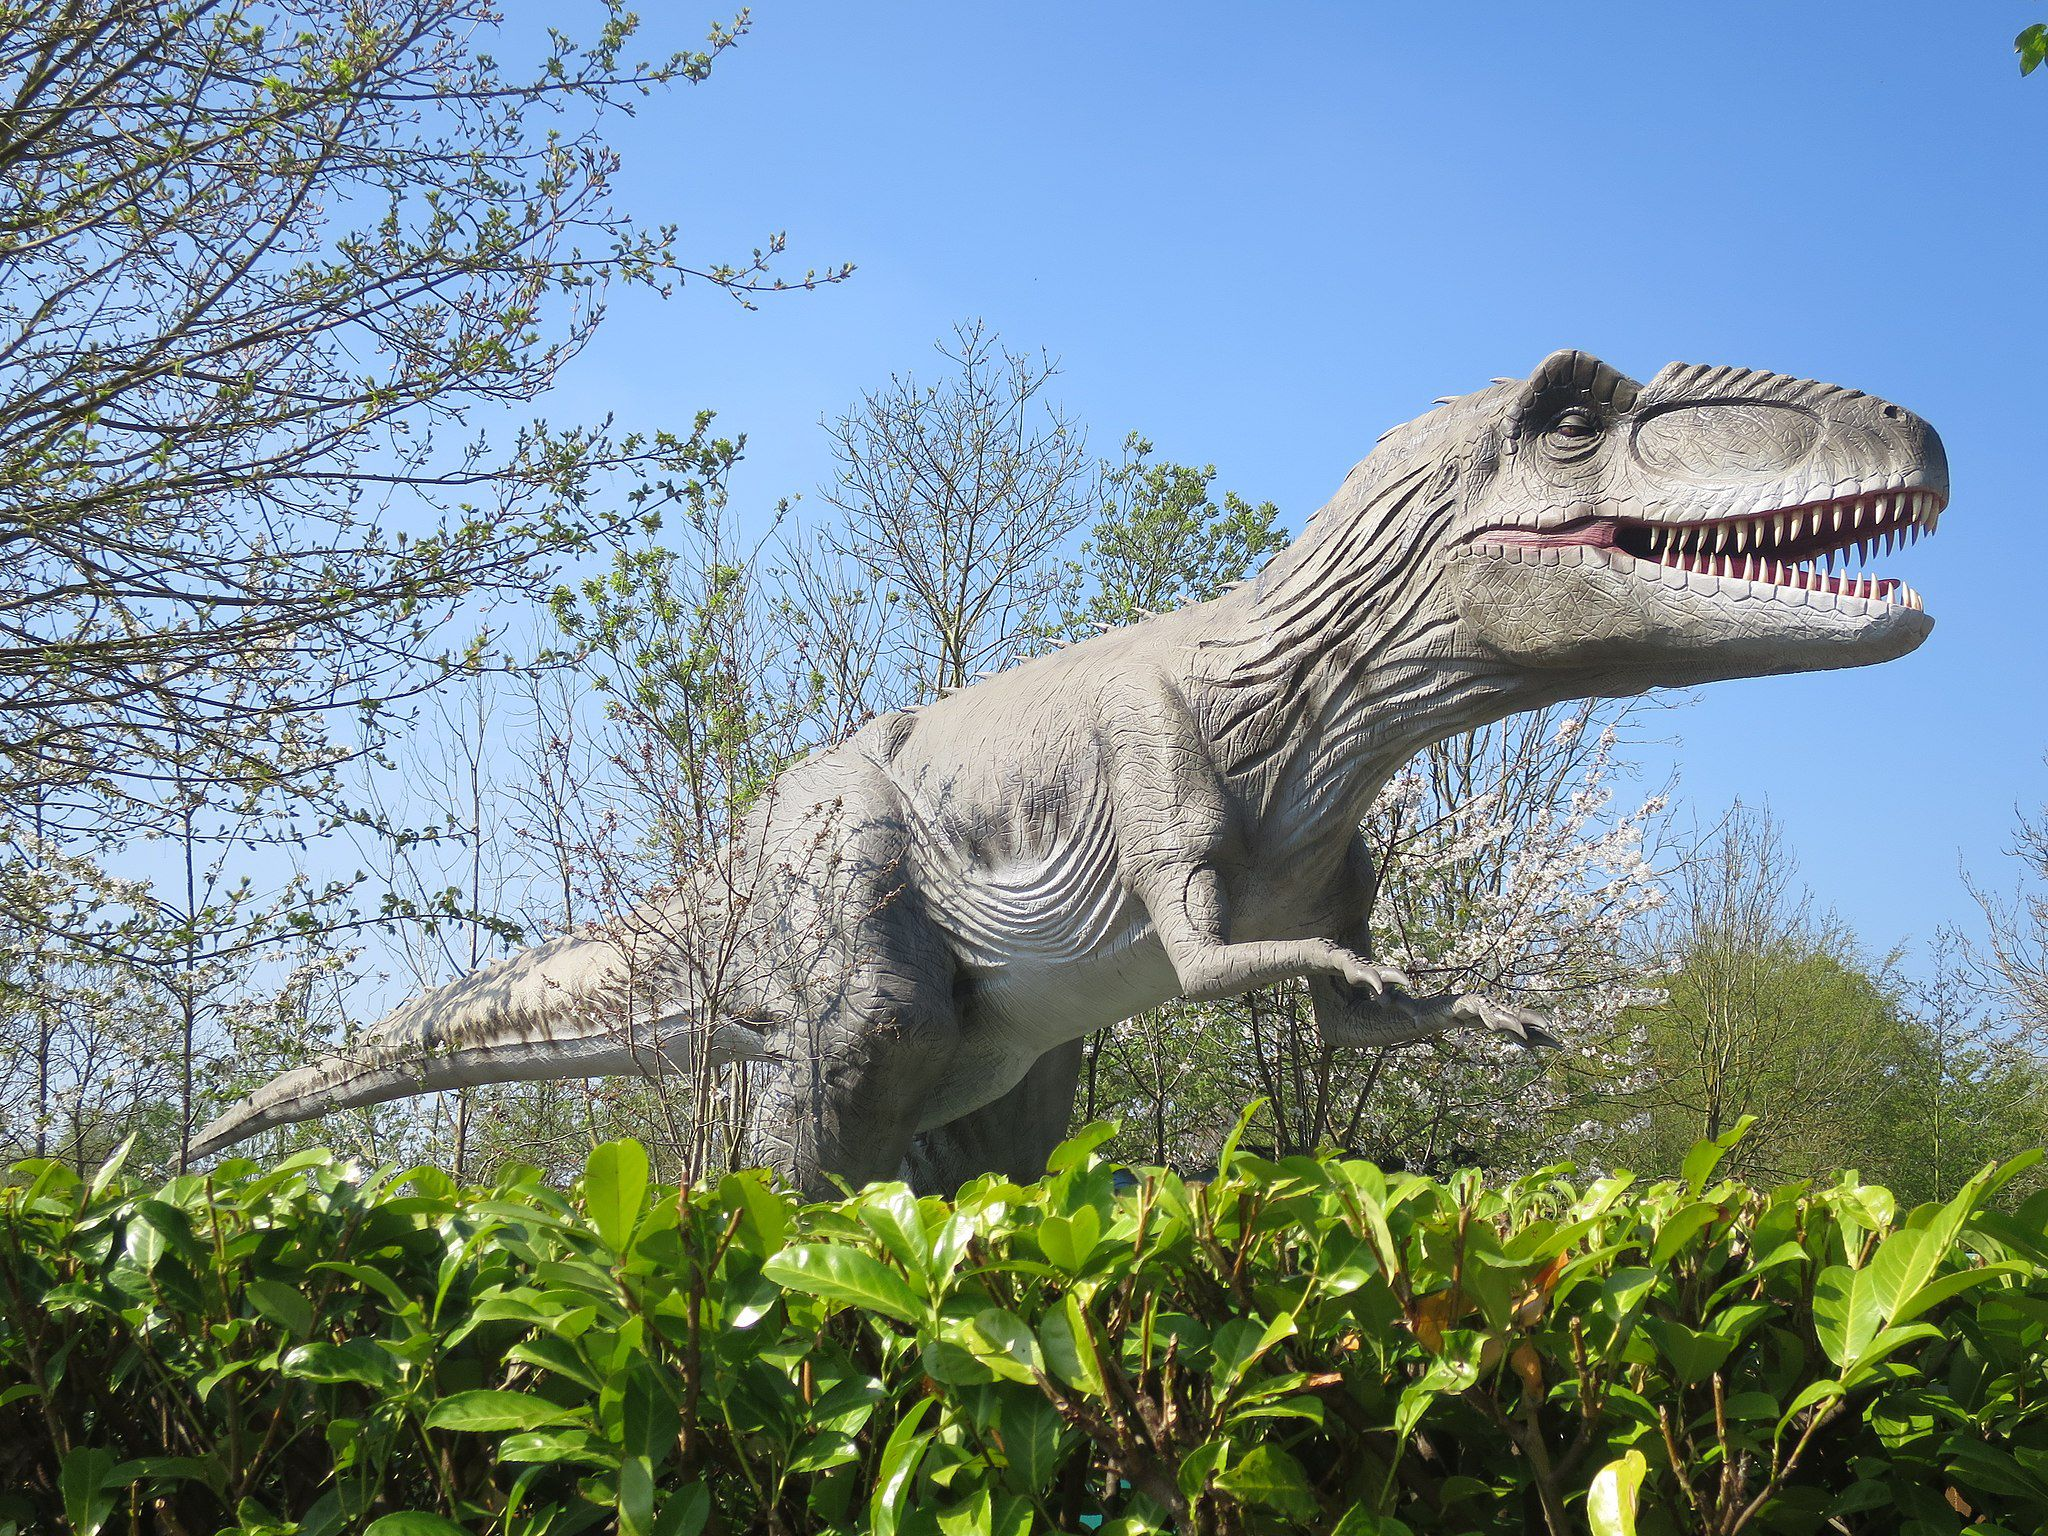 Animatronic Dinosaurs at Gulliver's